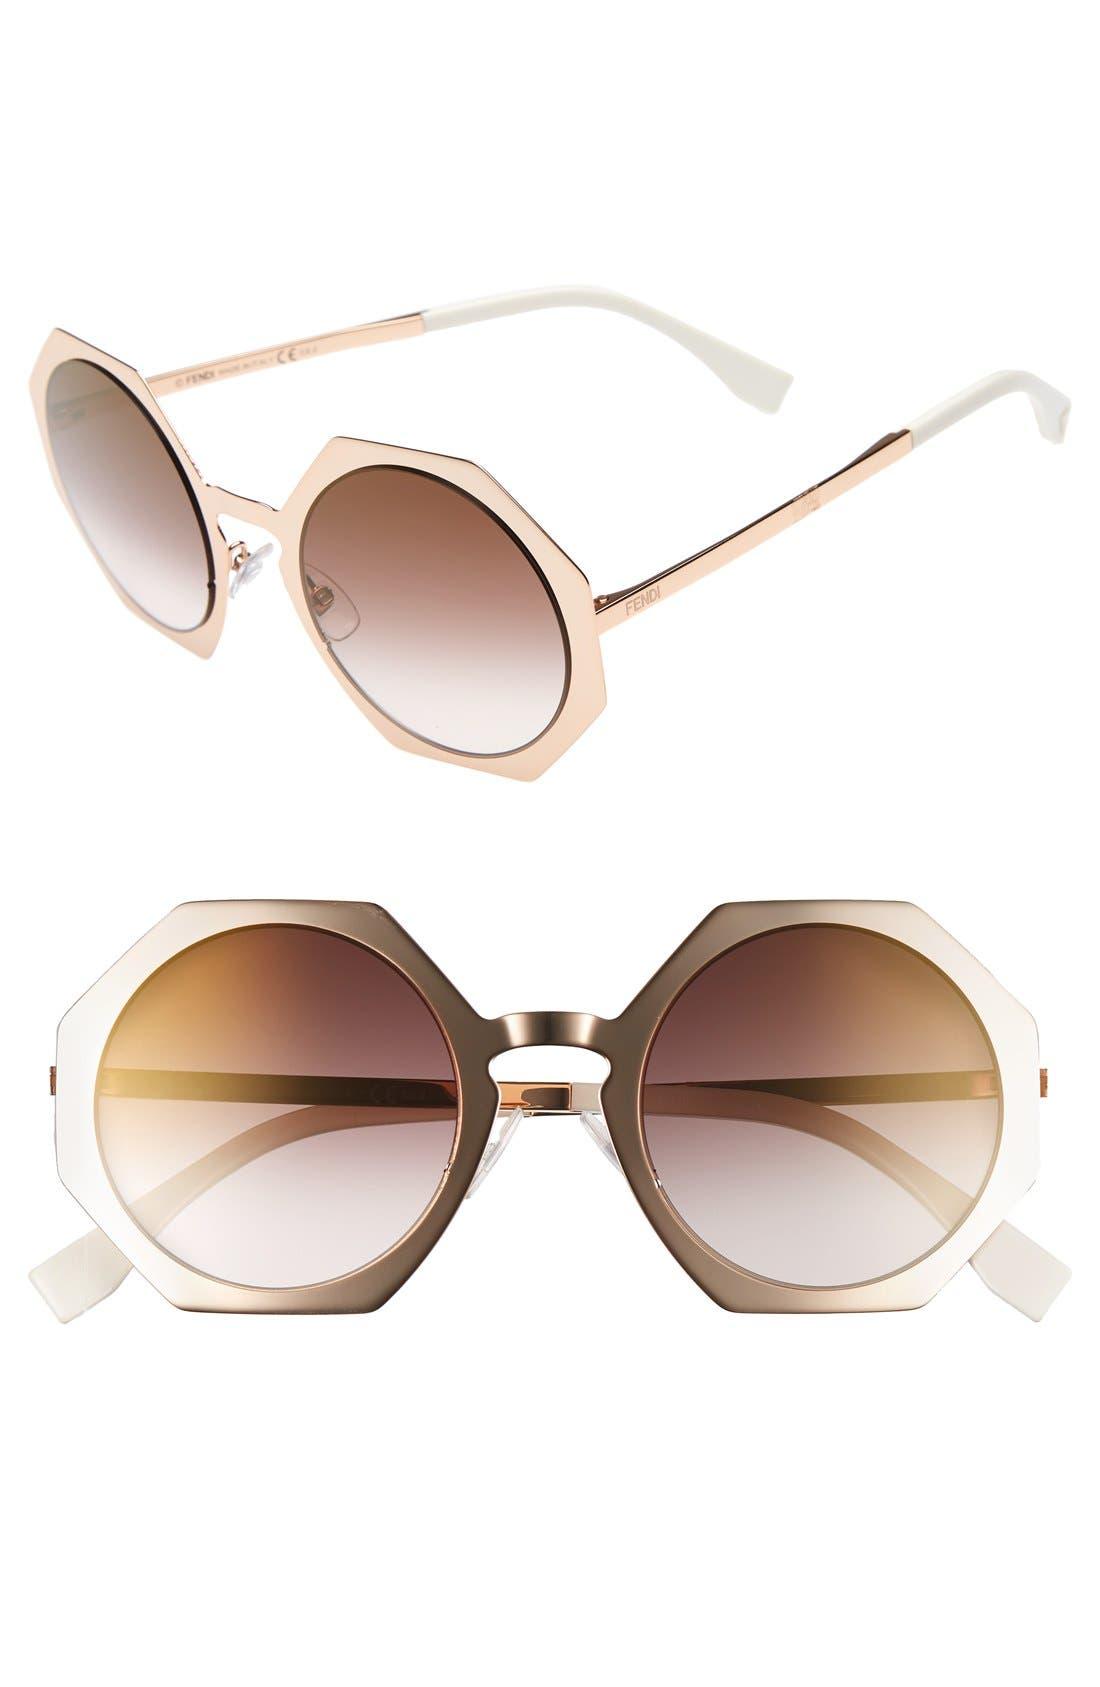 51mm Retro Octagon Sunglasses,                             Main thumbnail 3, color,